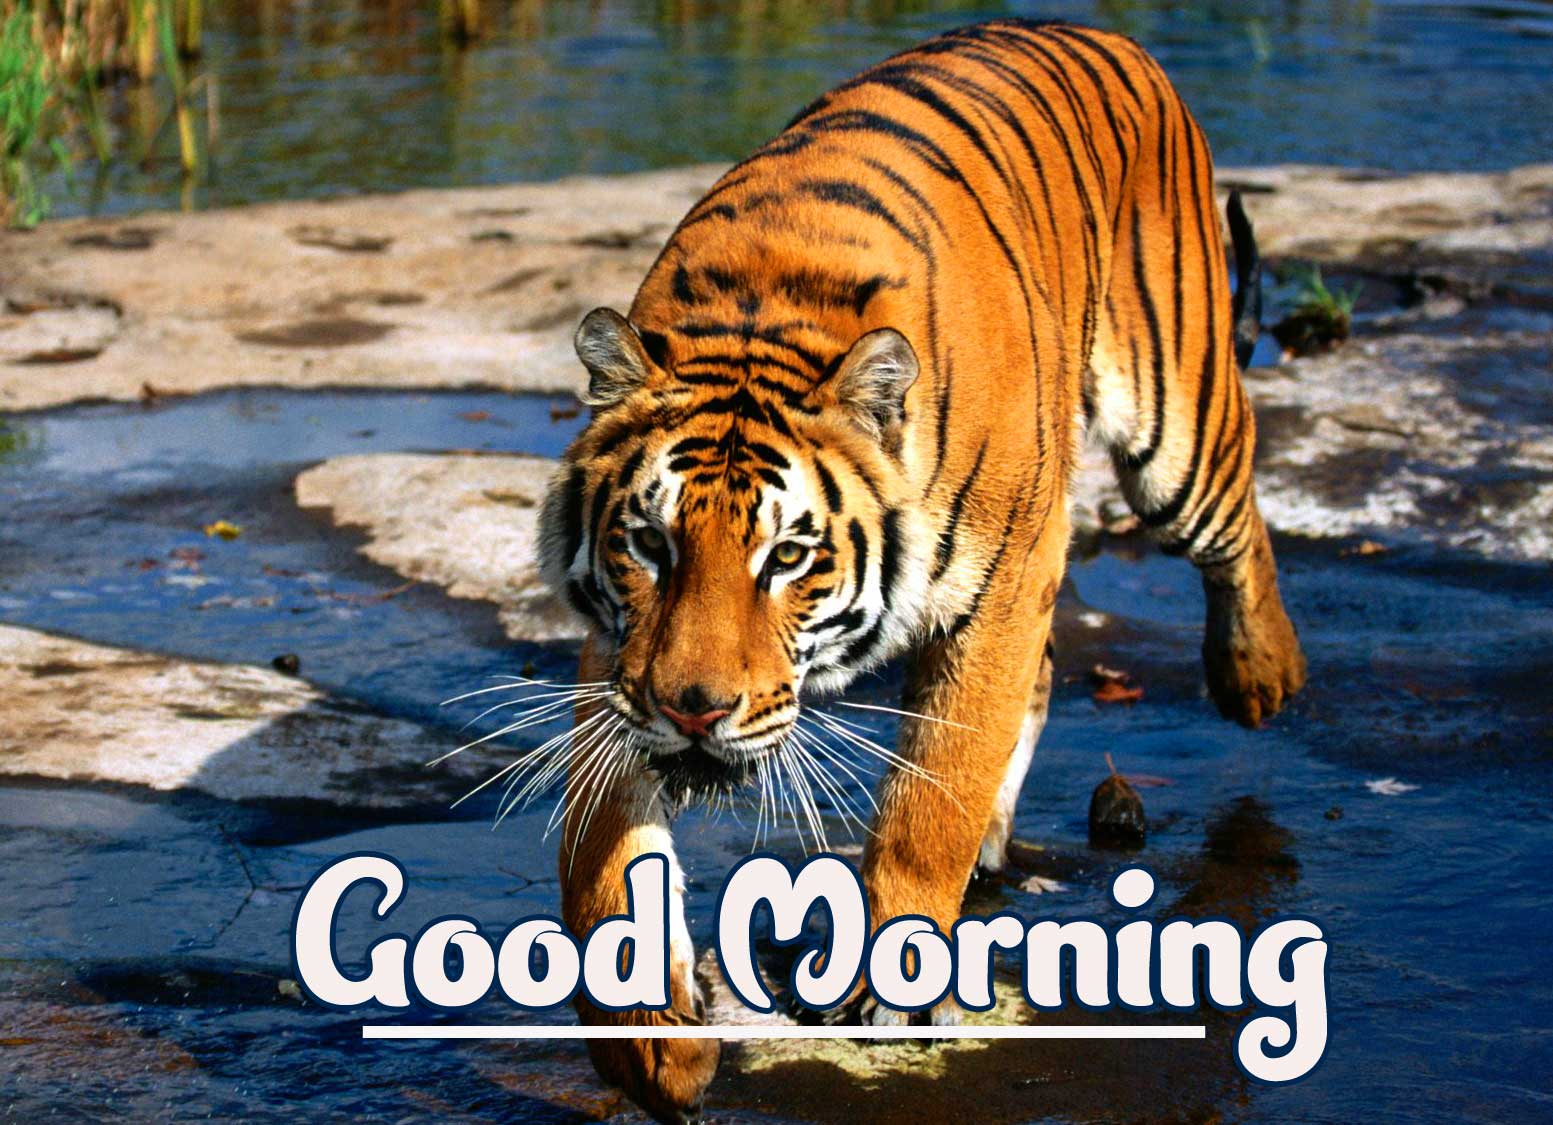 Animal Bird Lion Good Morning Wishes Wallpaper Free for Facebook